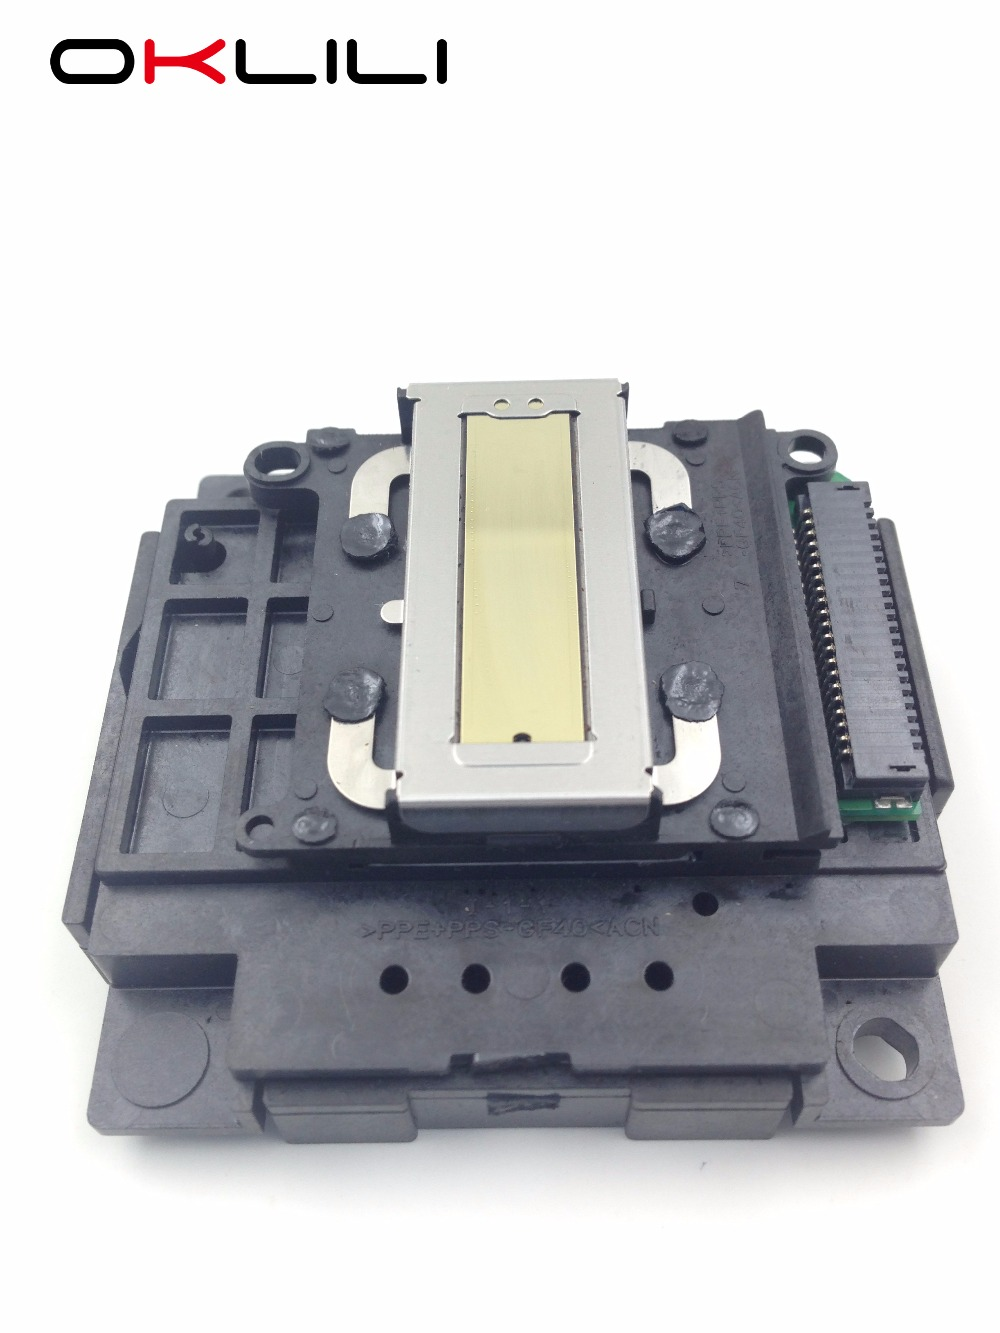 FA04000 FA04010 Cap de imprimare pentru cap de imprimare pentru Epson WF-2010 WF-2510 WF-2520 WF-2530 WF-2540 ME401 ME303 WF2010 WF2510